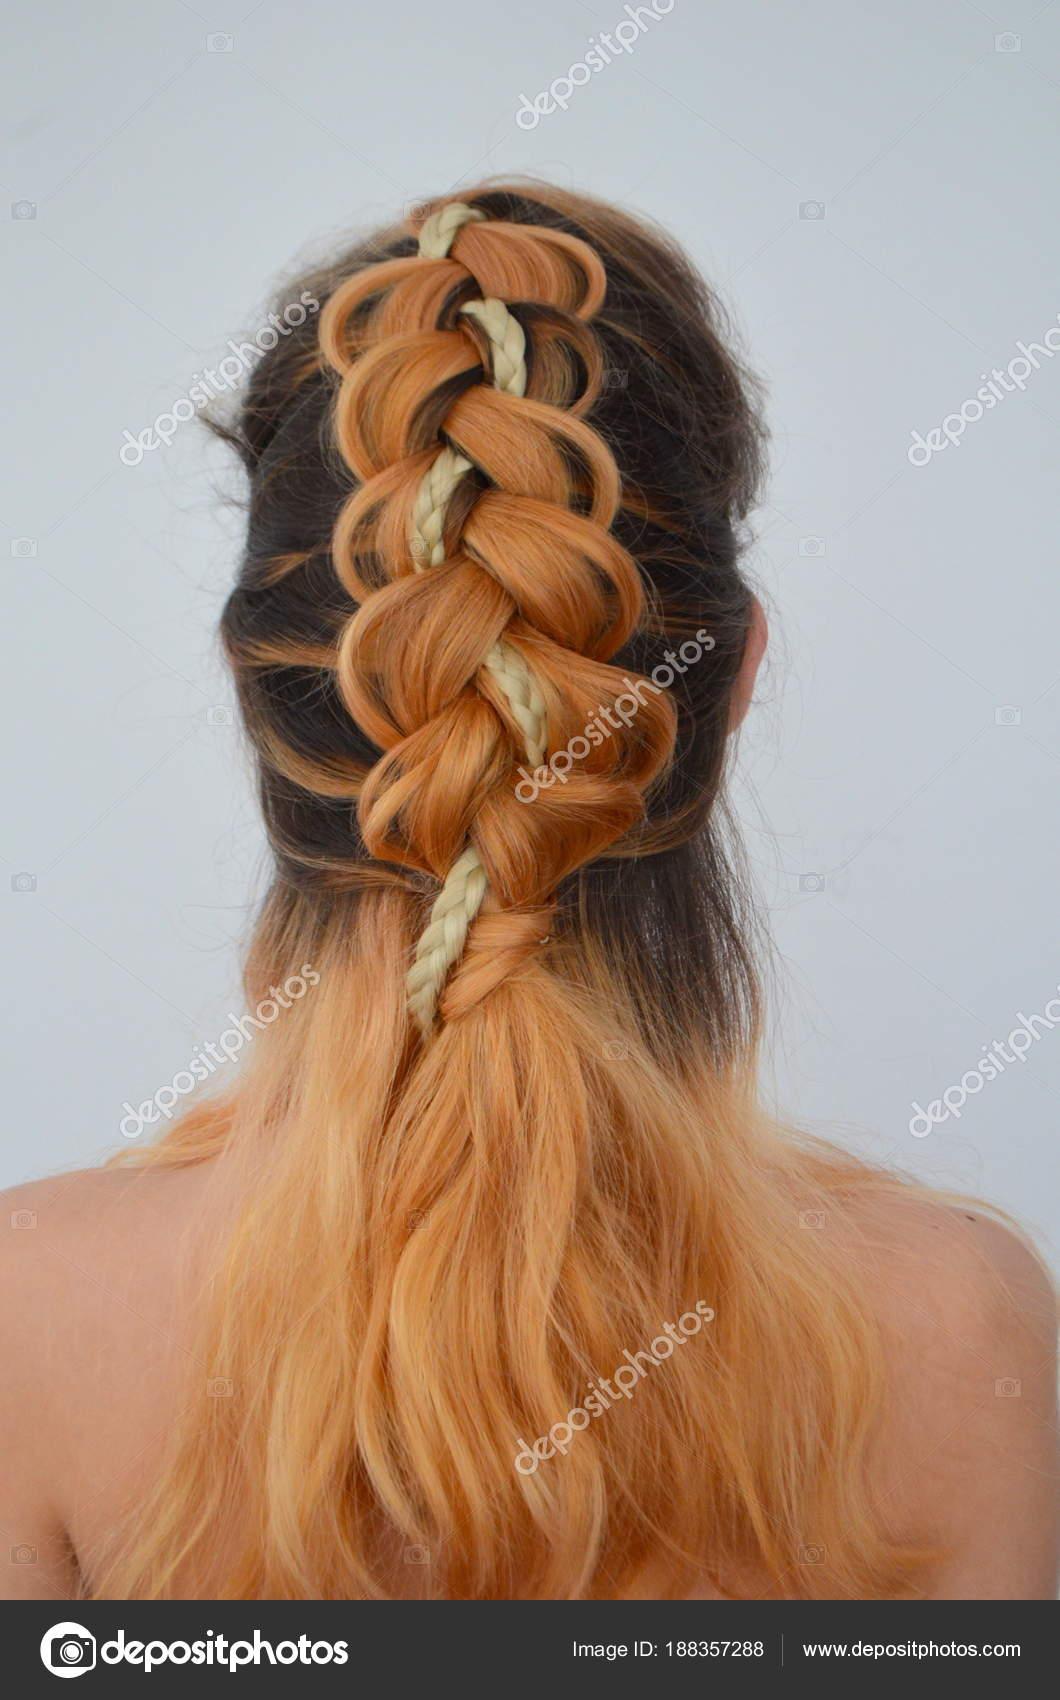 Teenager Mädchen Mit Modernen Haar Zöpfe Kanekalon Naturfarben